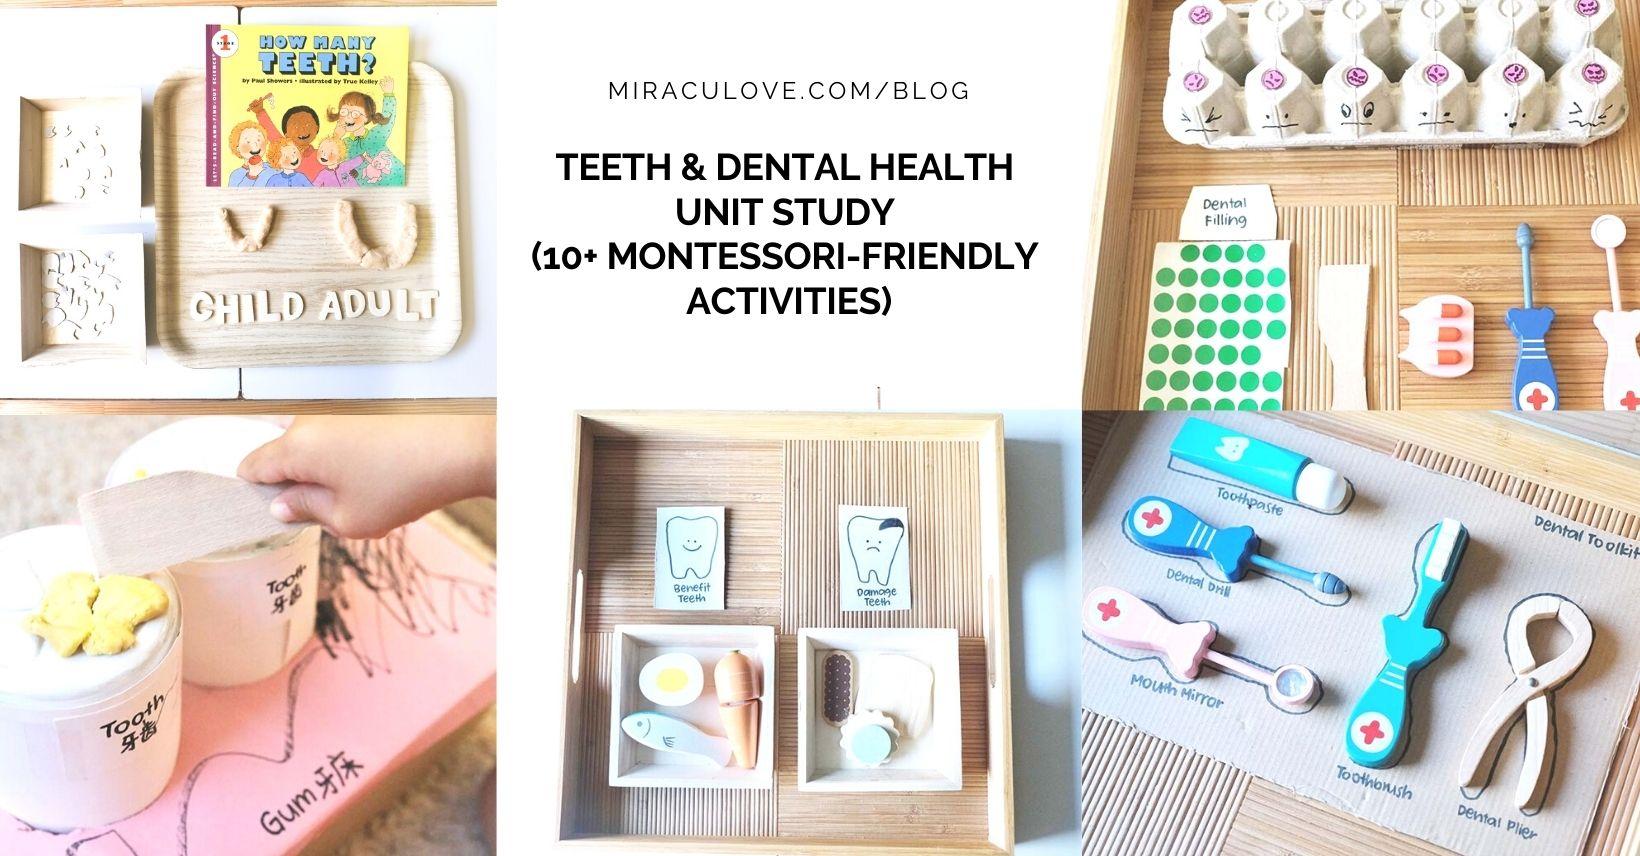 Teeth & Dental Health Unit Study (10+ Montessori-friendly Activities)